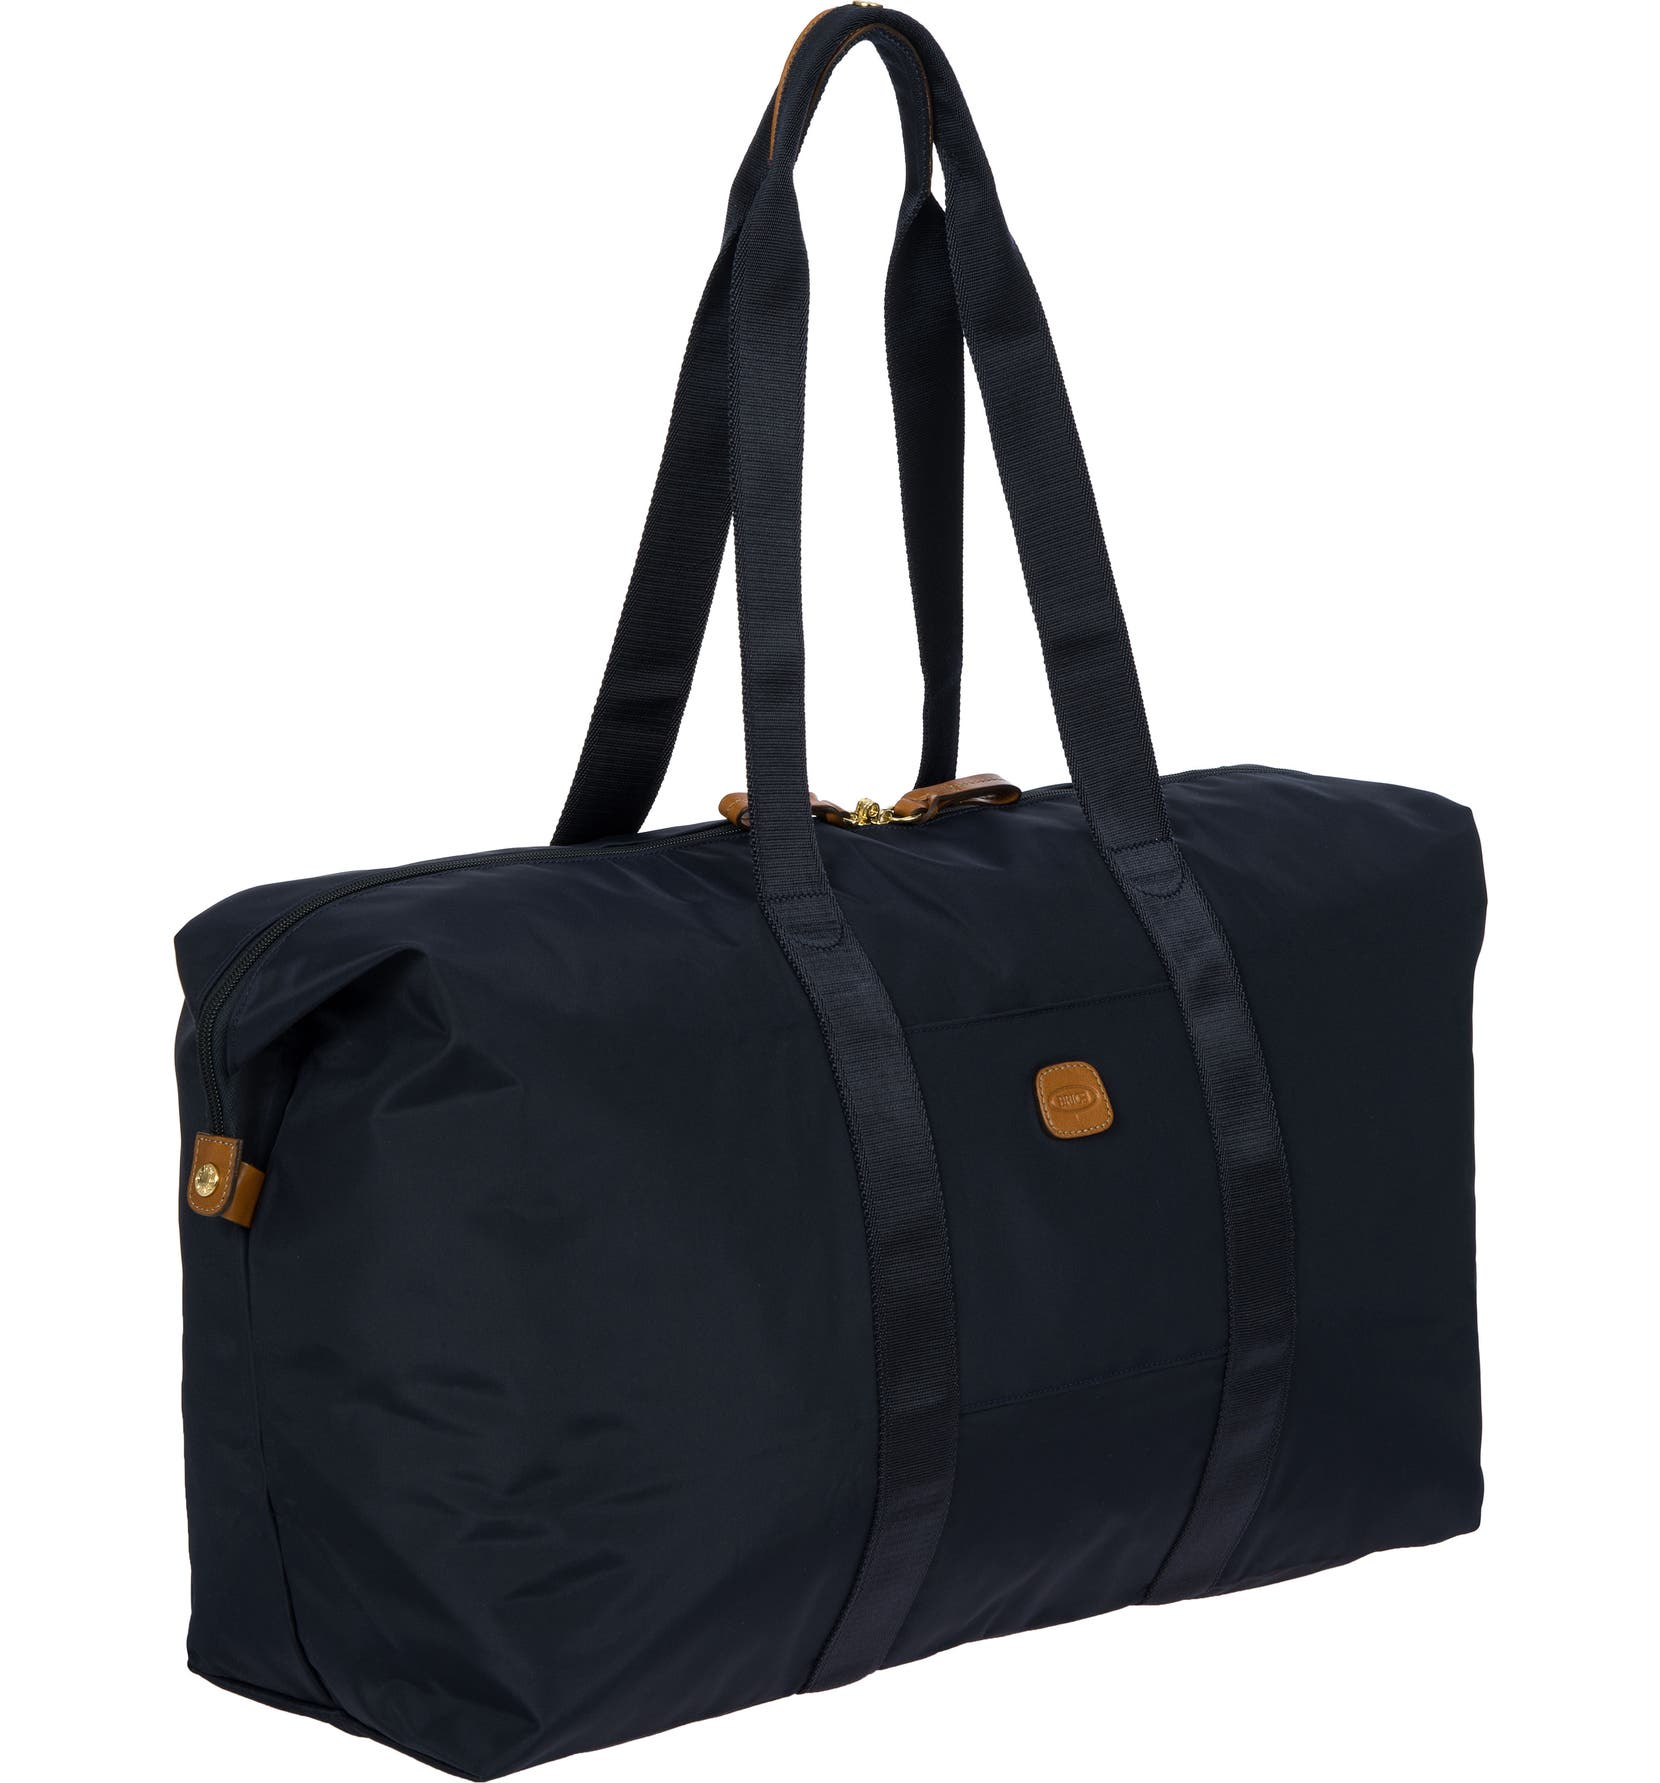 Brics X Bag 22 Inch Folding Duffle